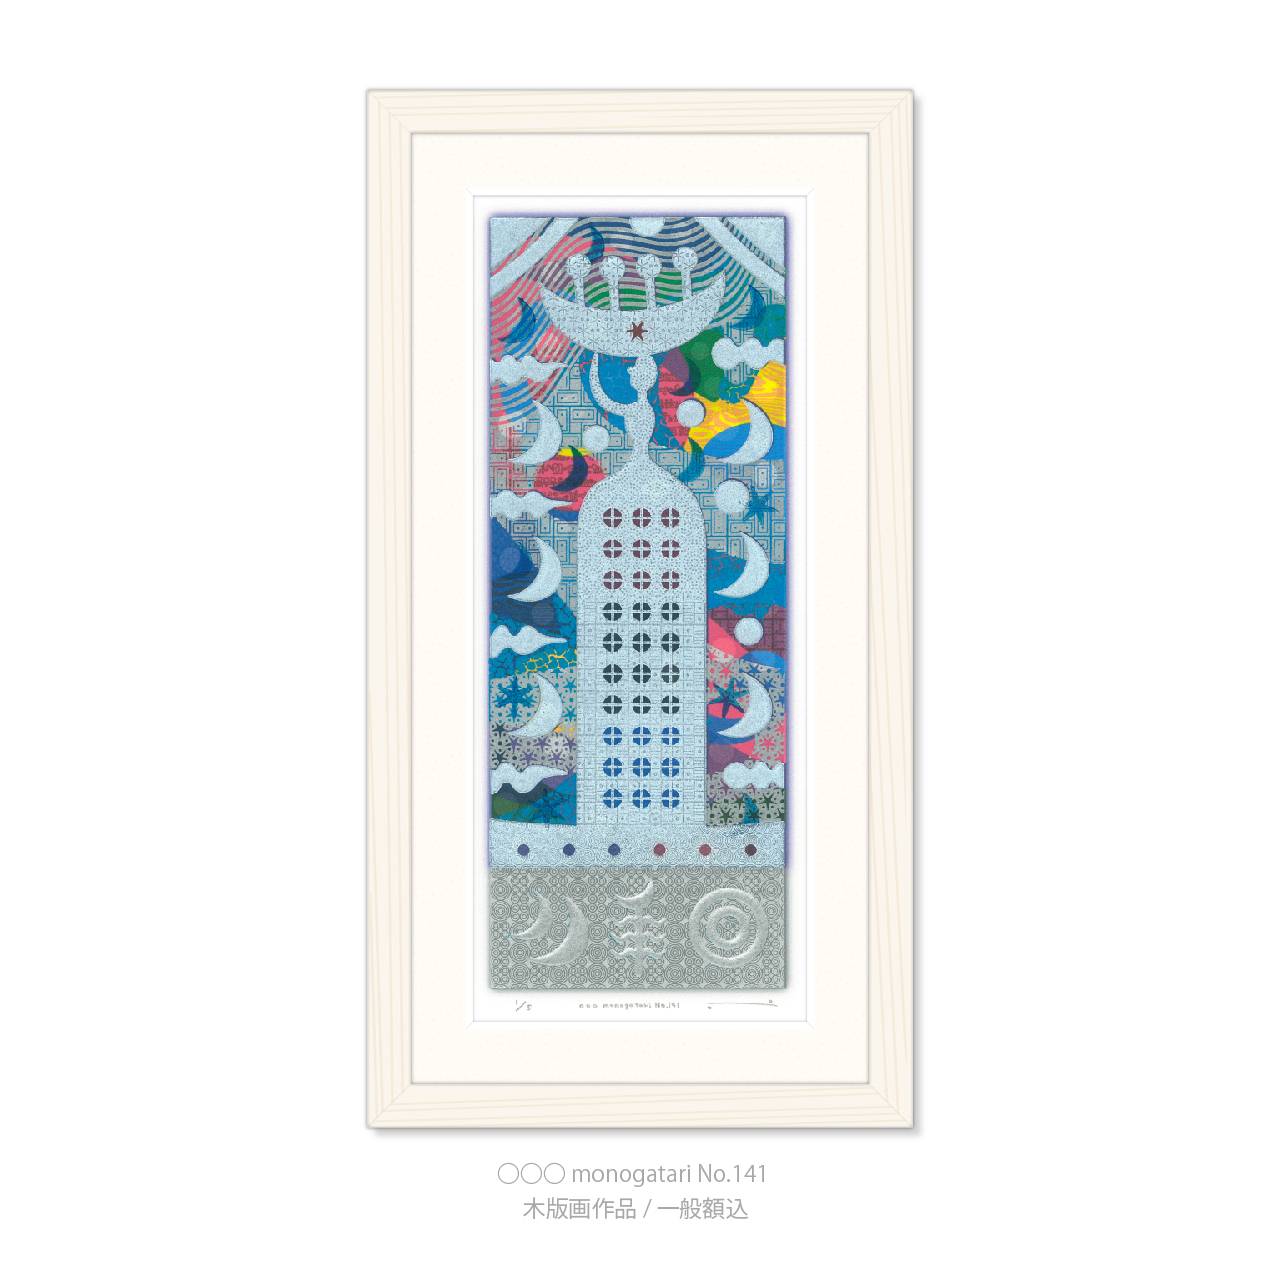 ○○○ monogatari No.141